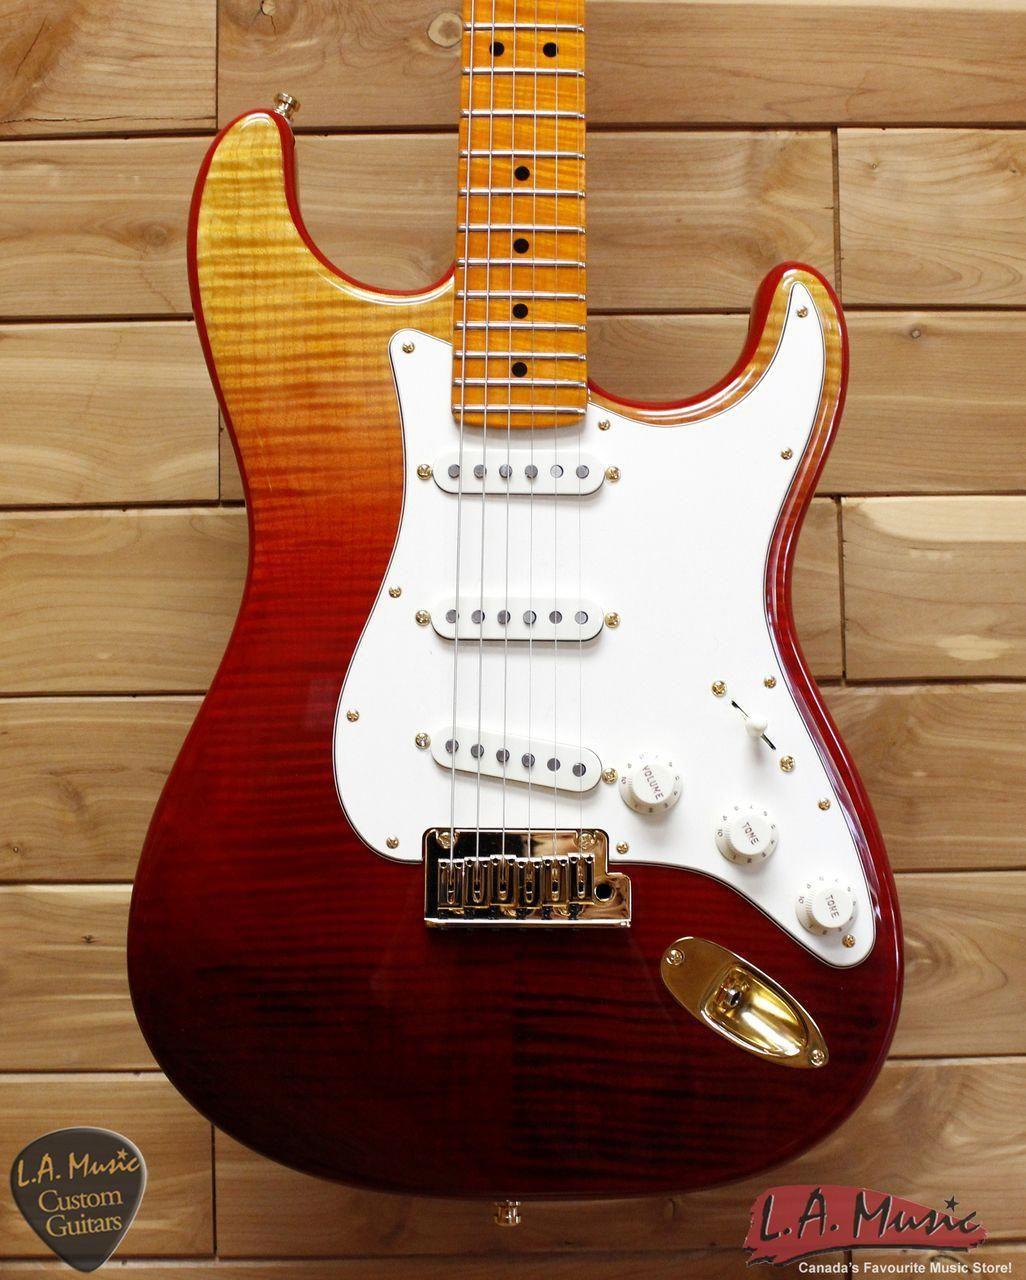 Vintage Guitars That Are Amazing Telecasterguitar Cool Electric Guitars Guitar Fender Guitars